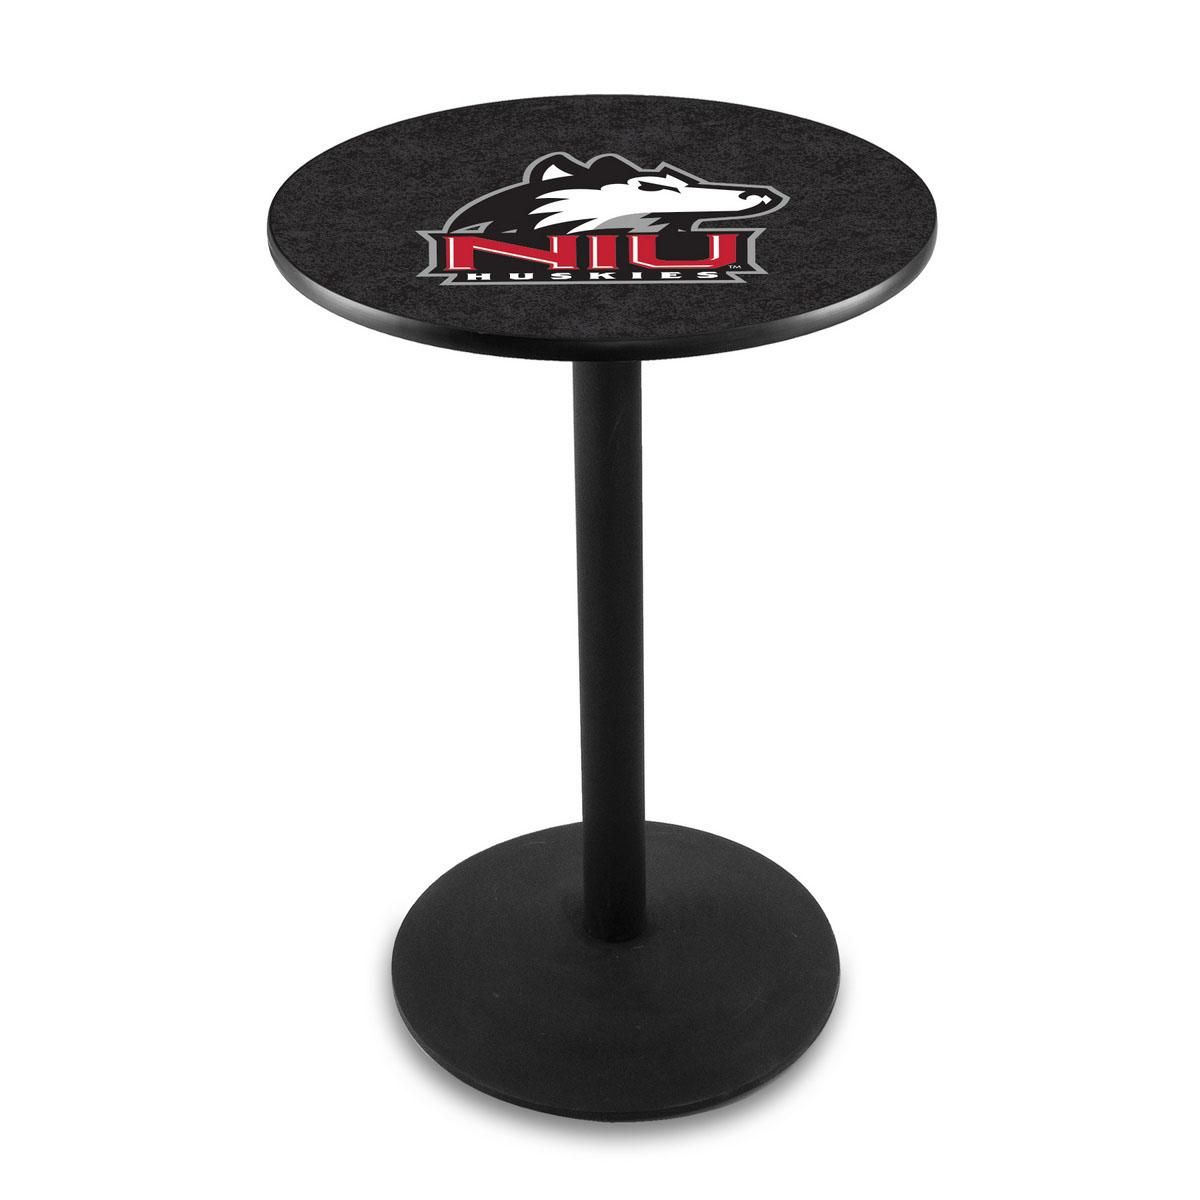 Splendid University Northern Illinois Logo Pub Bar Table Round Stand Product Photo